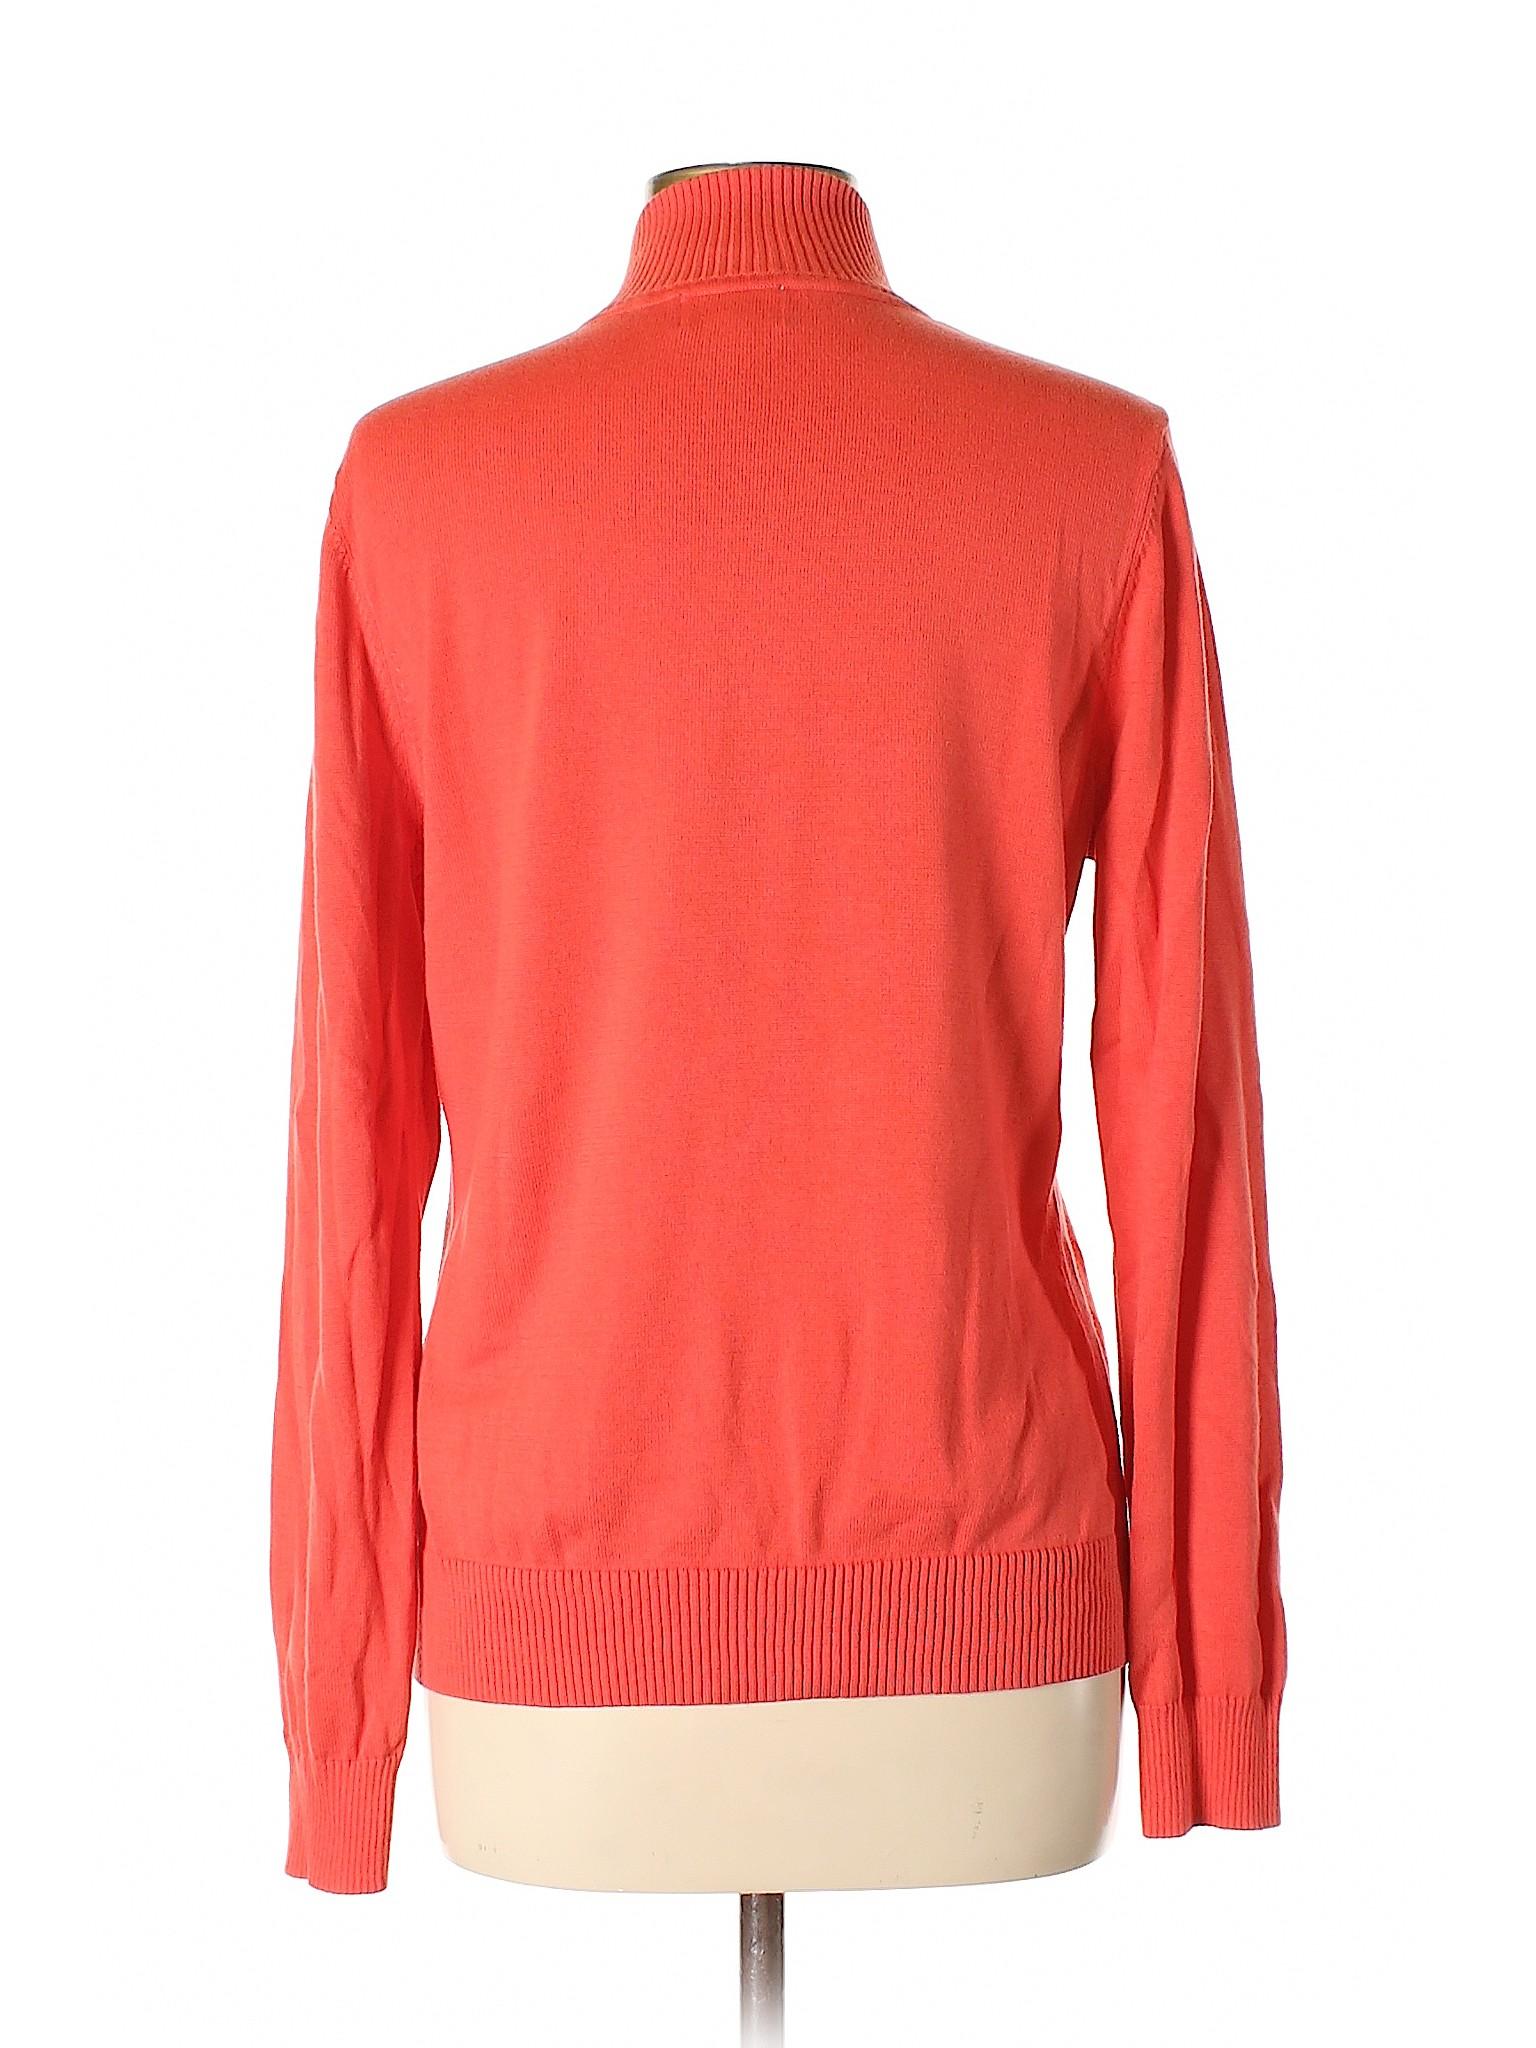 Sweater Foxcroft Pullover winter Boutique winter Boutique zqTfRwvP